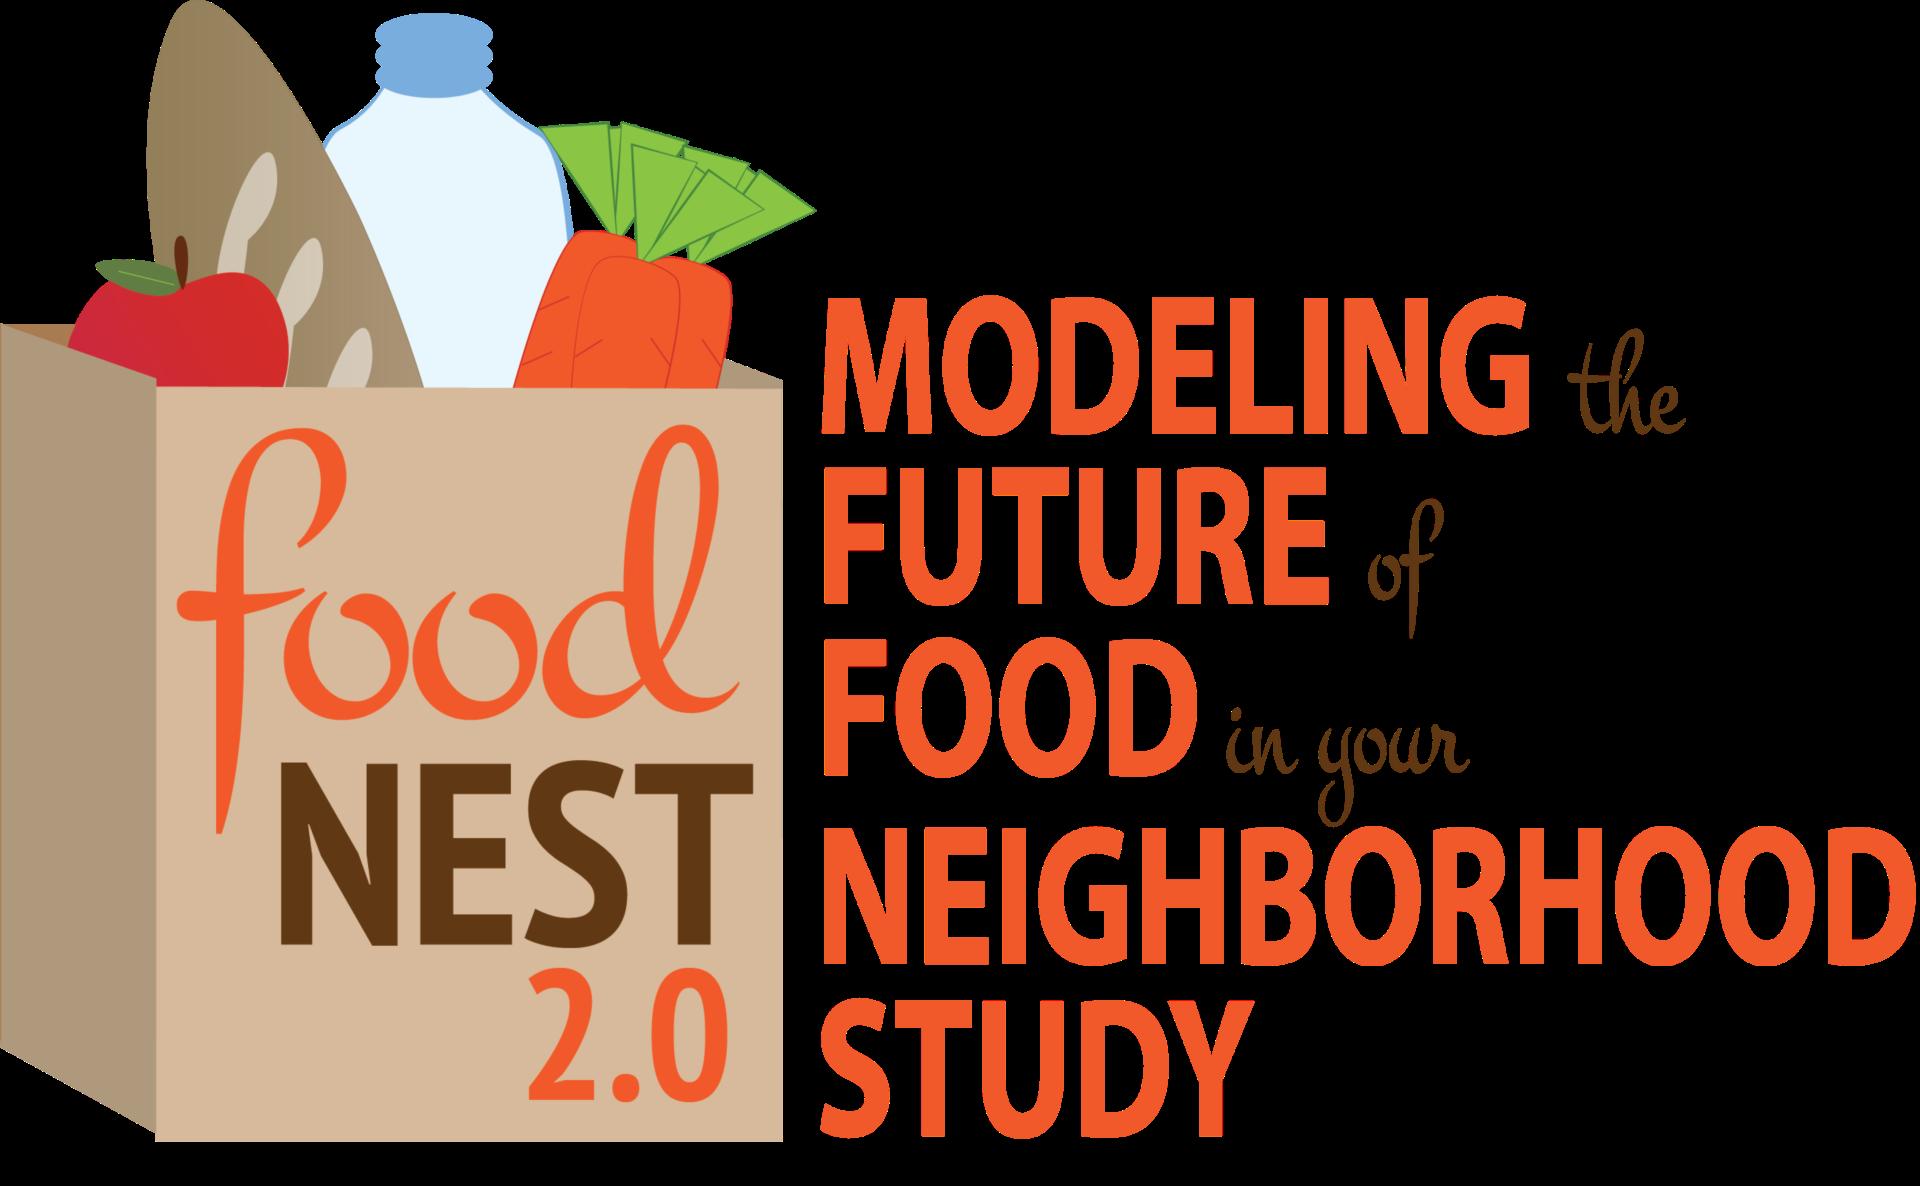 foodNEST 2.0 logo